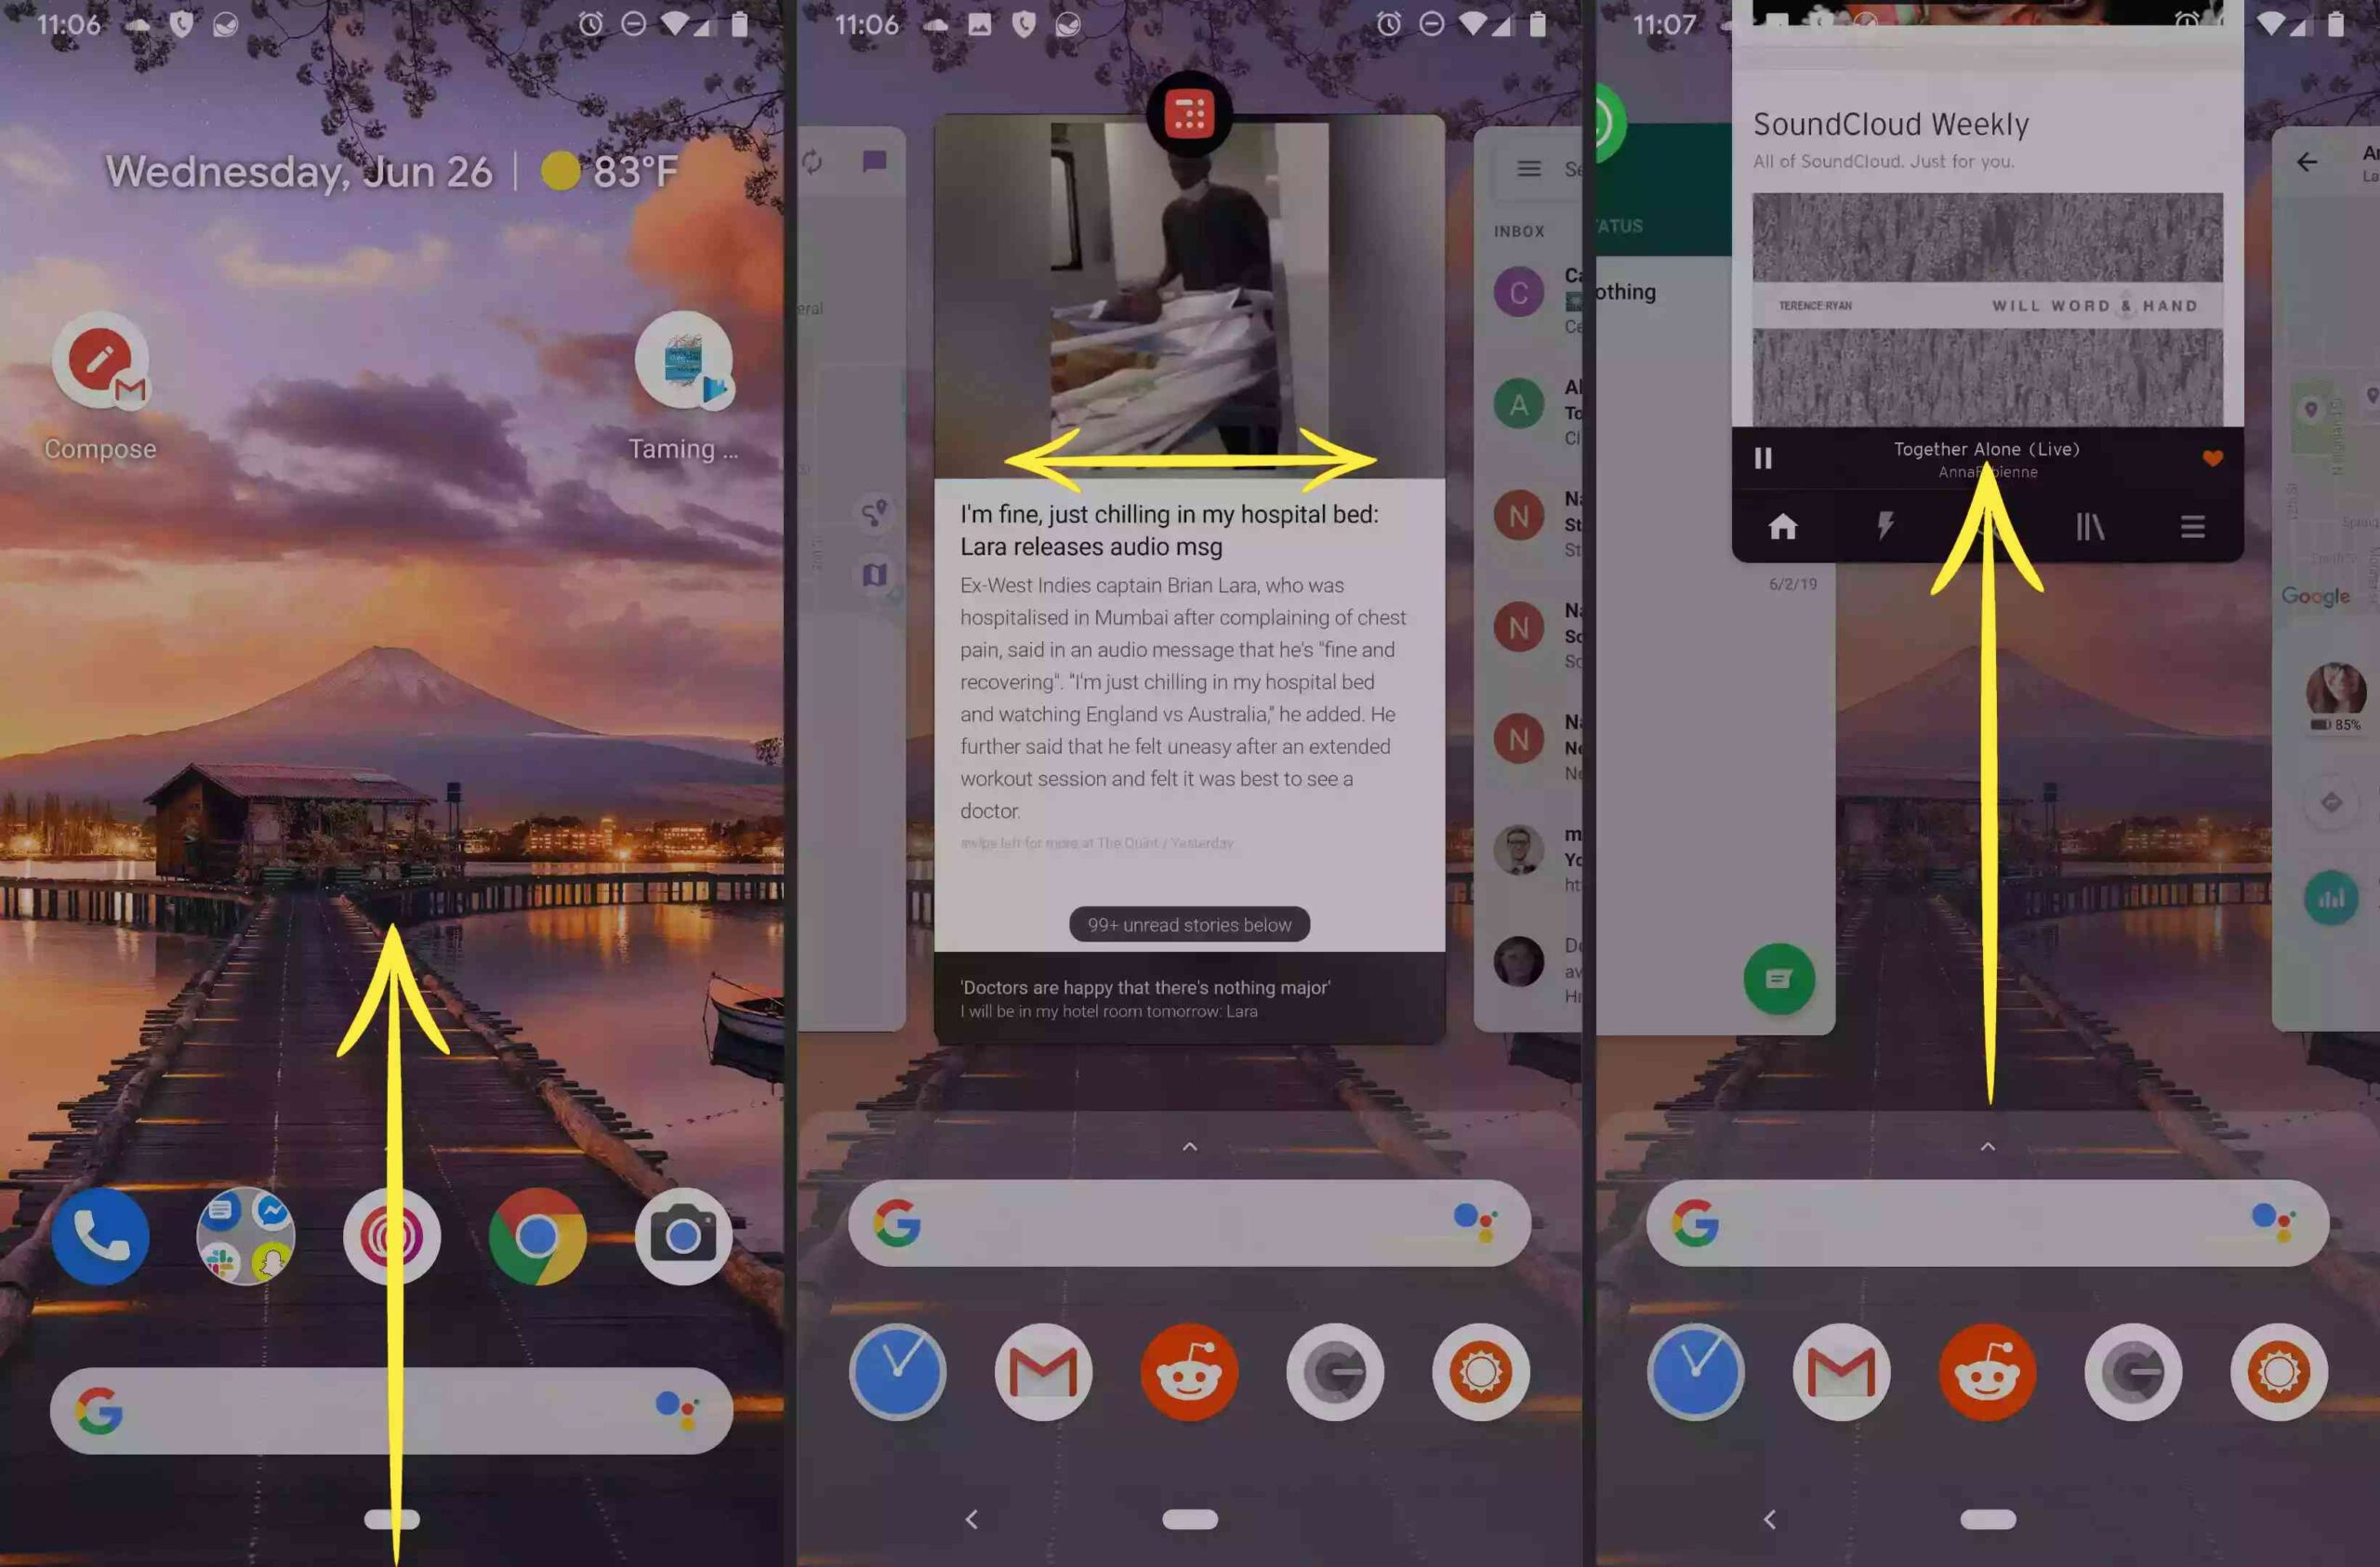 Cómo reiniciar un teléfono inteligente, Móvil o tableta Android